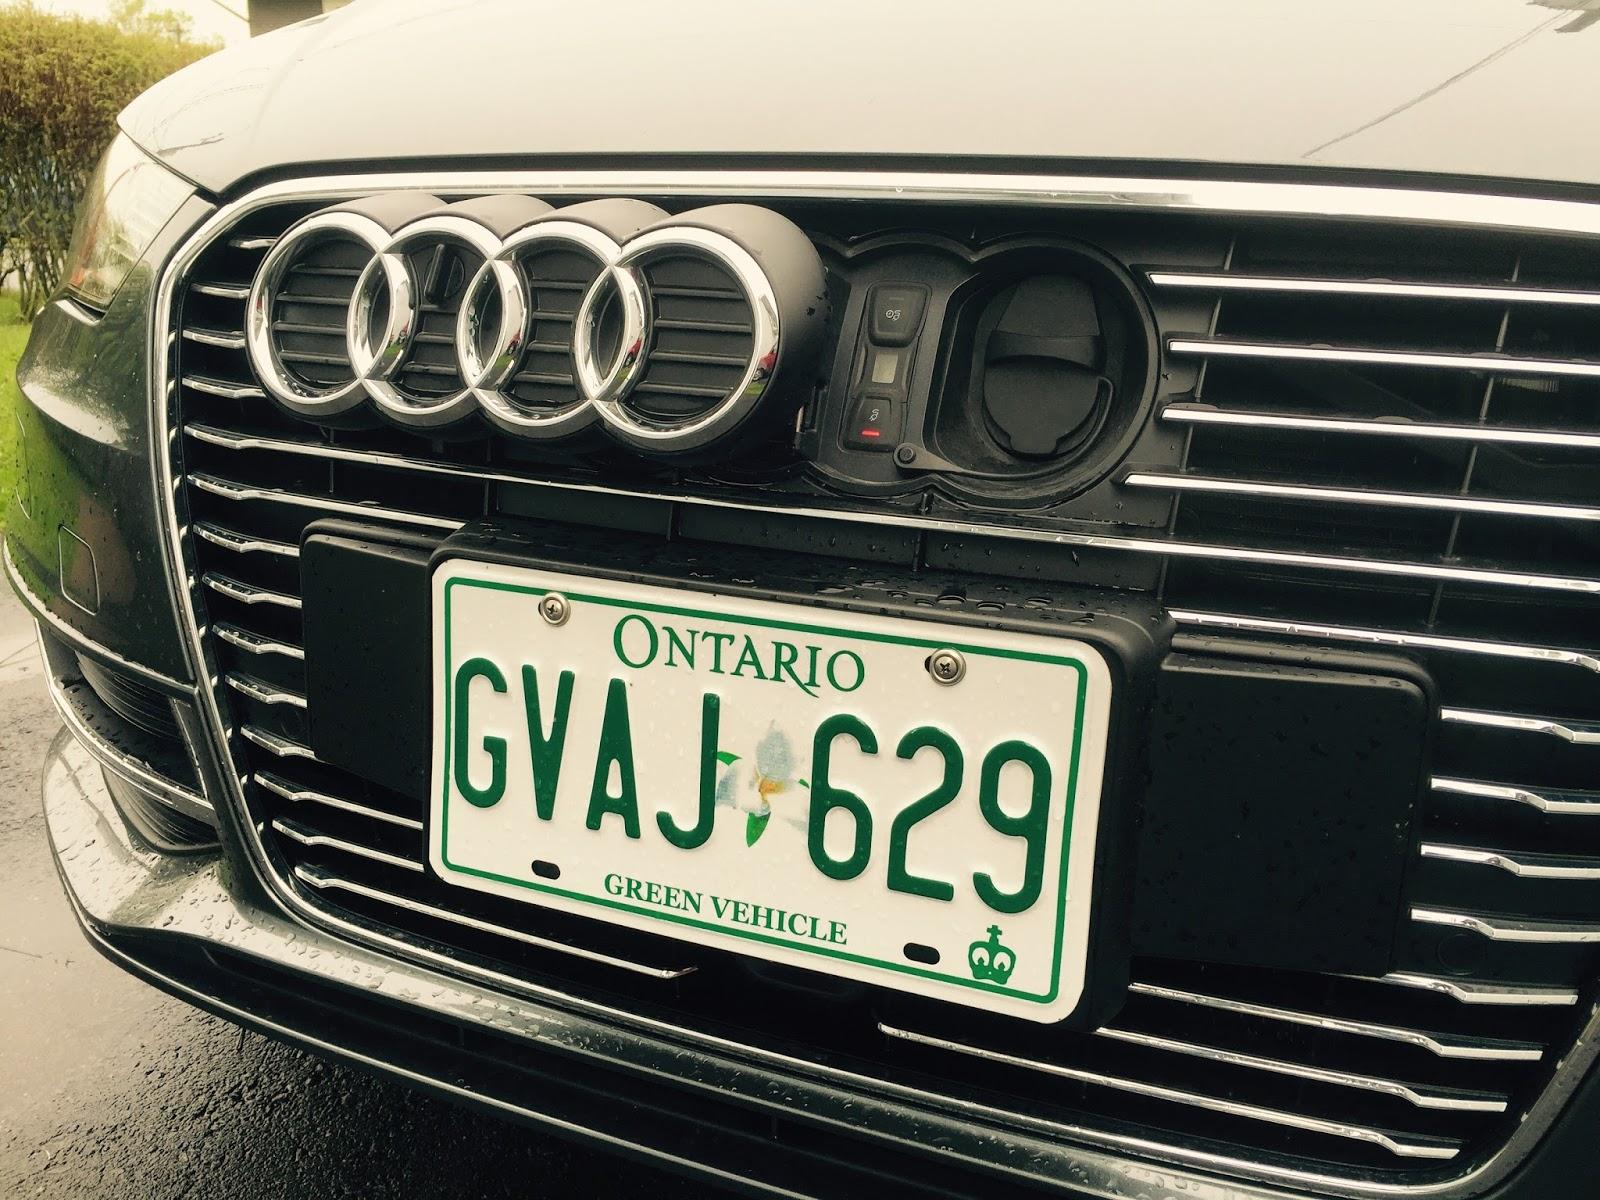 Audi A ETron Review The Audi Of Volts GCBC - Audi car number